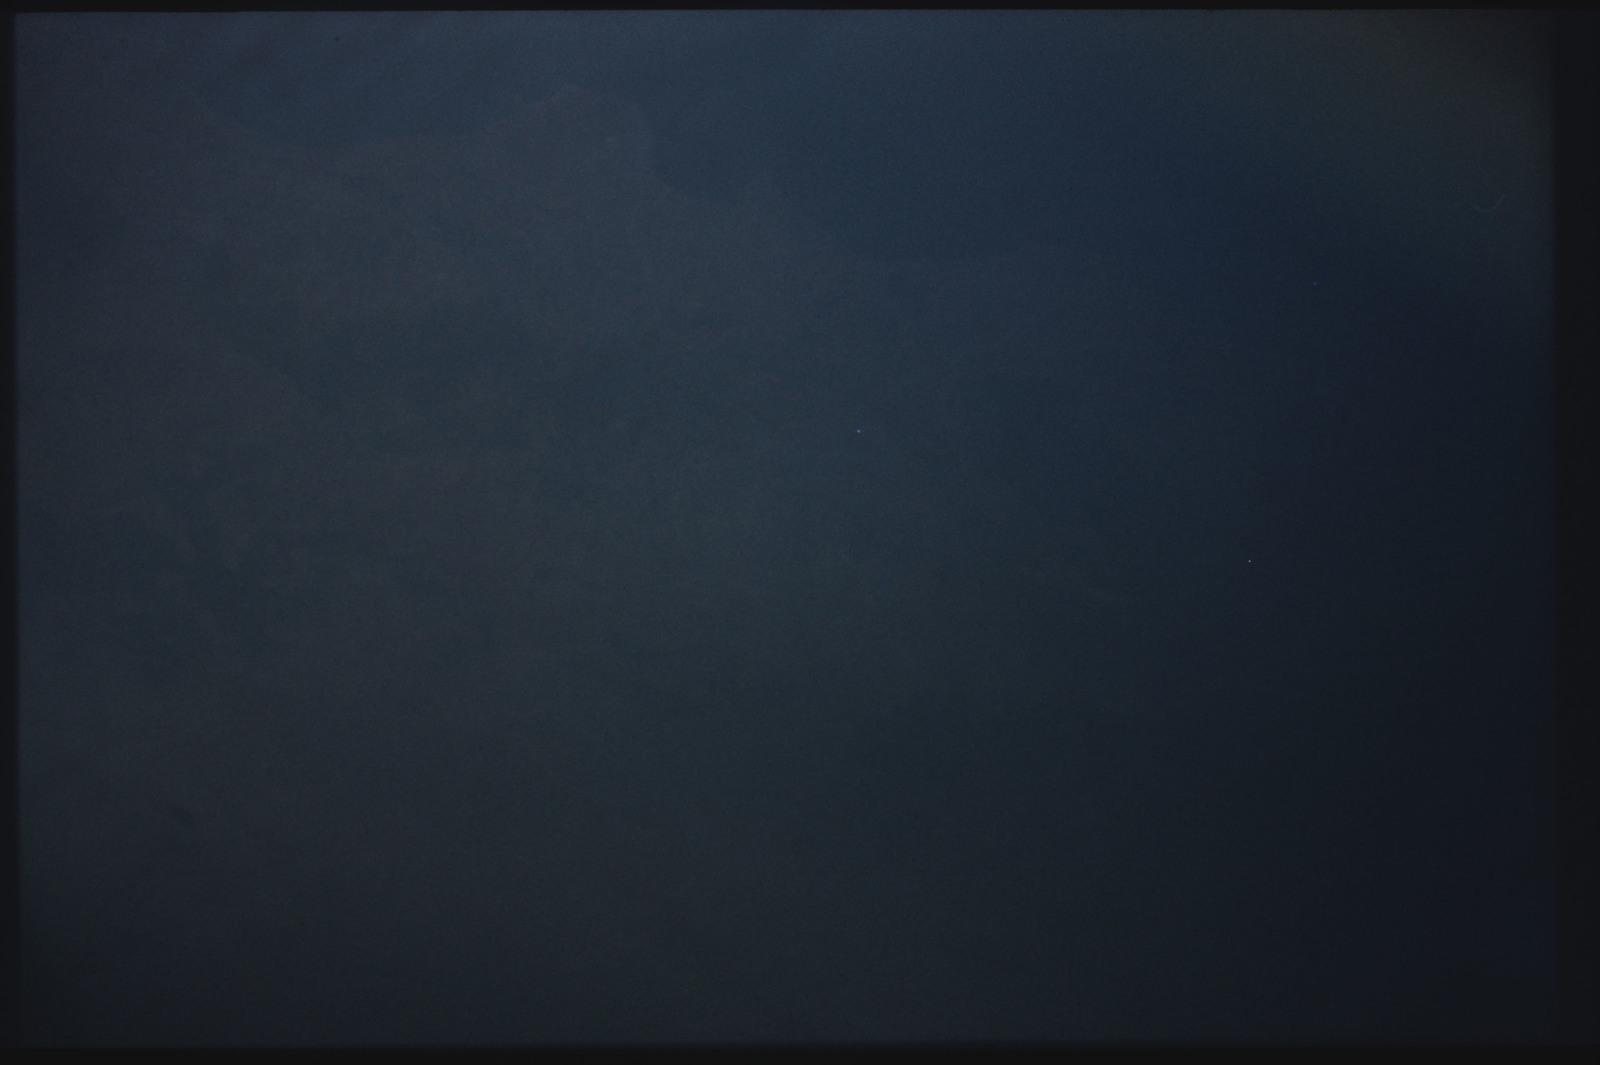 AST-07-396 - Apollo Soyuz Test Project - Apollo Soyuz Test Project, Earth view over Morocco, Mediterranian Coast